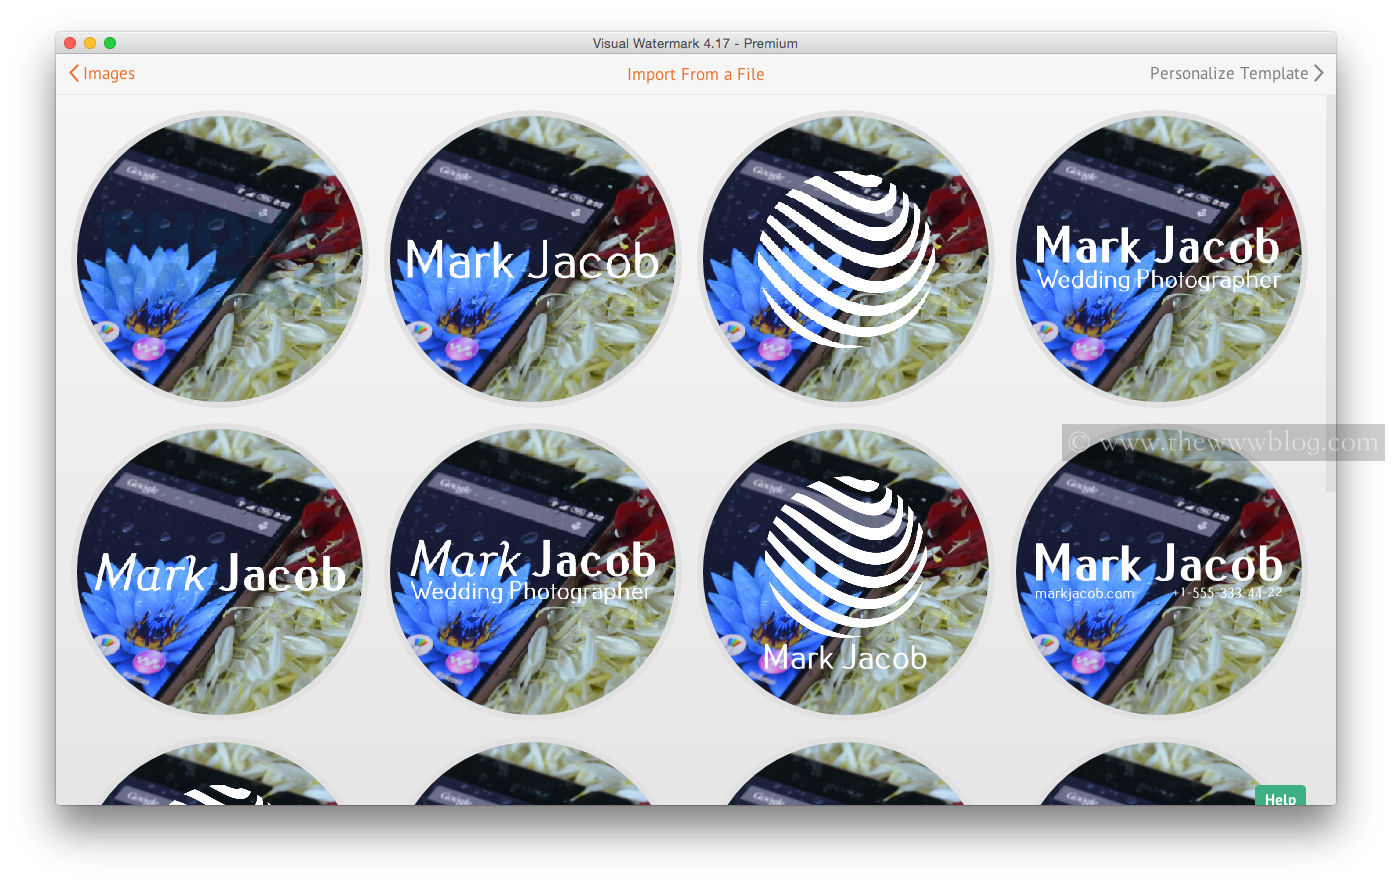 Visual Watermark Select Watermark Type